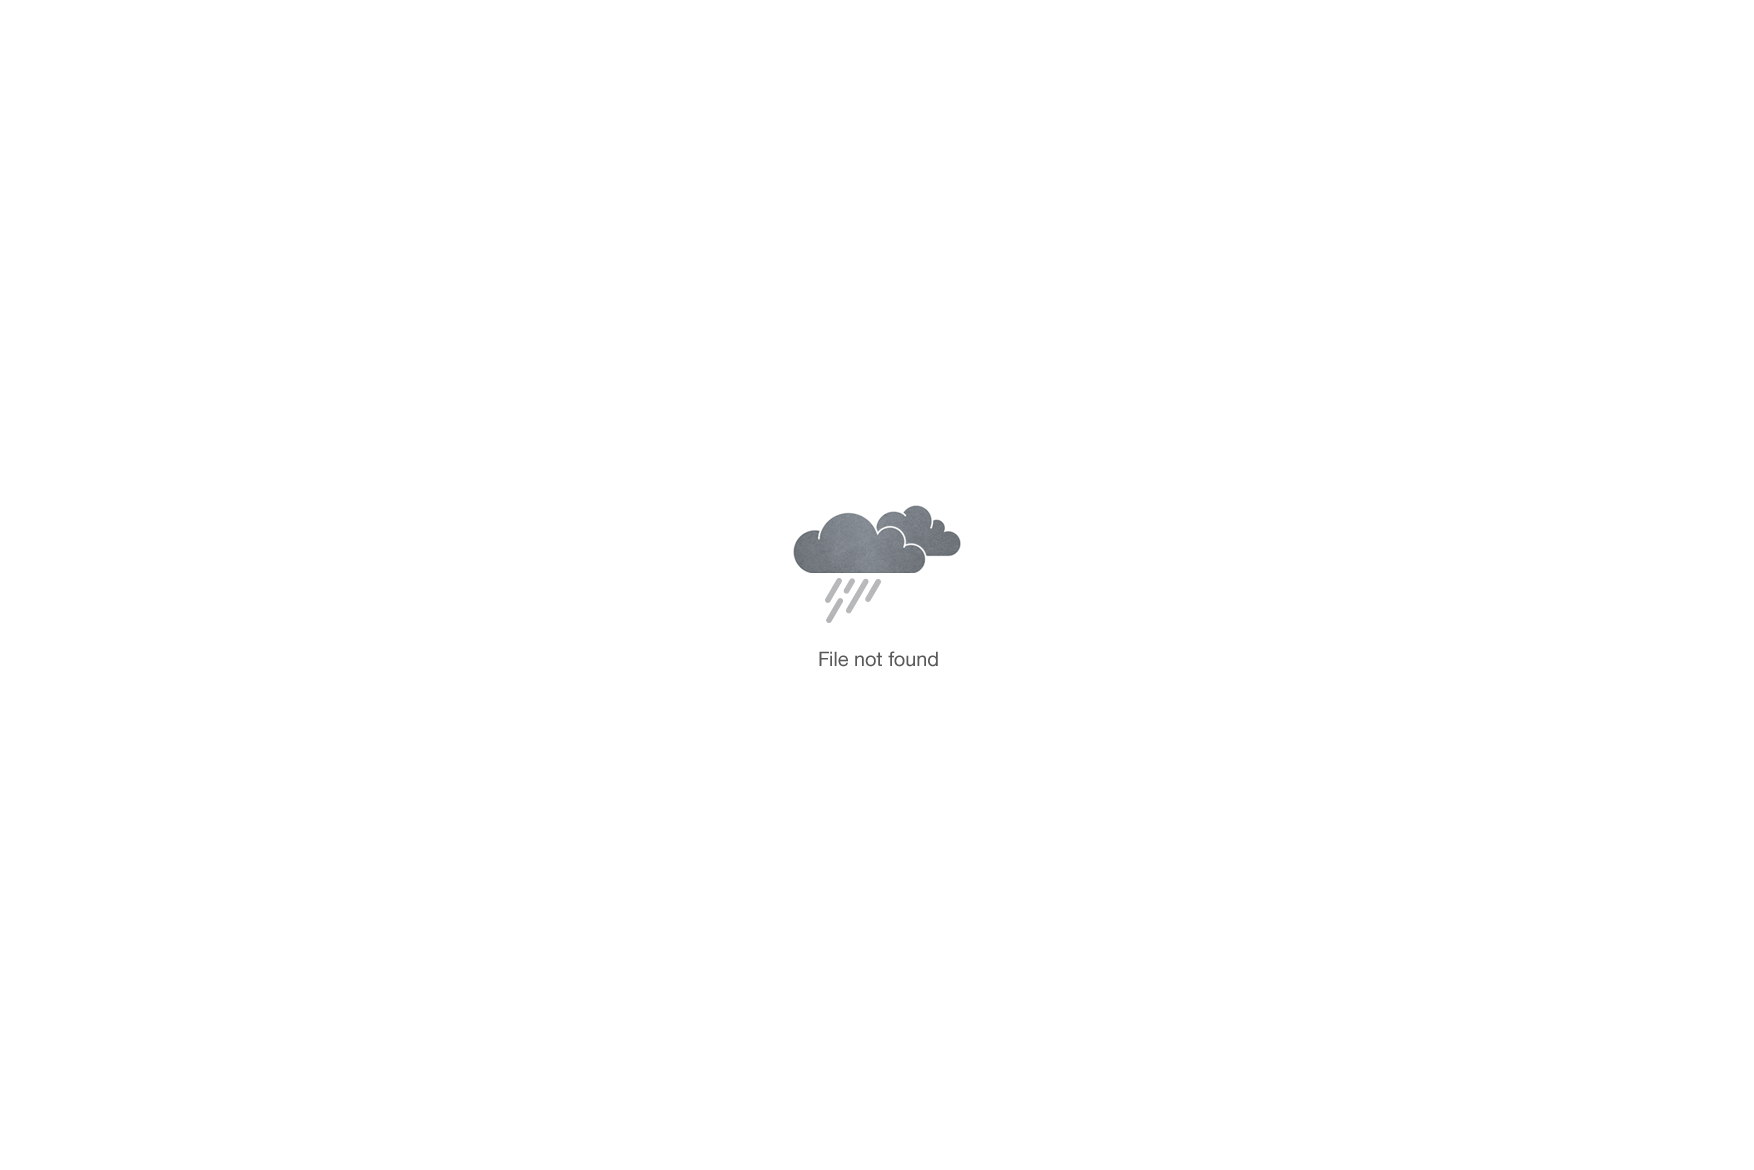 stephane-parisse-Rugby-Sponsorise-me-image-2